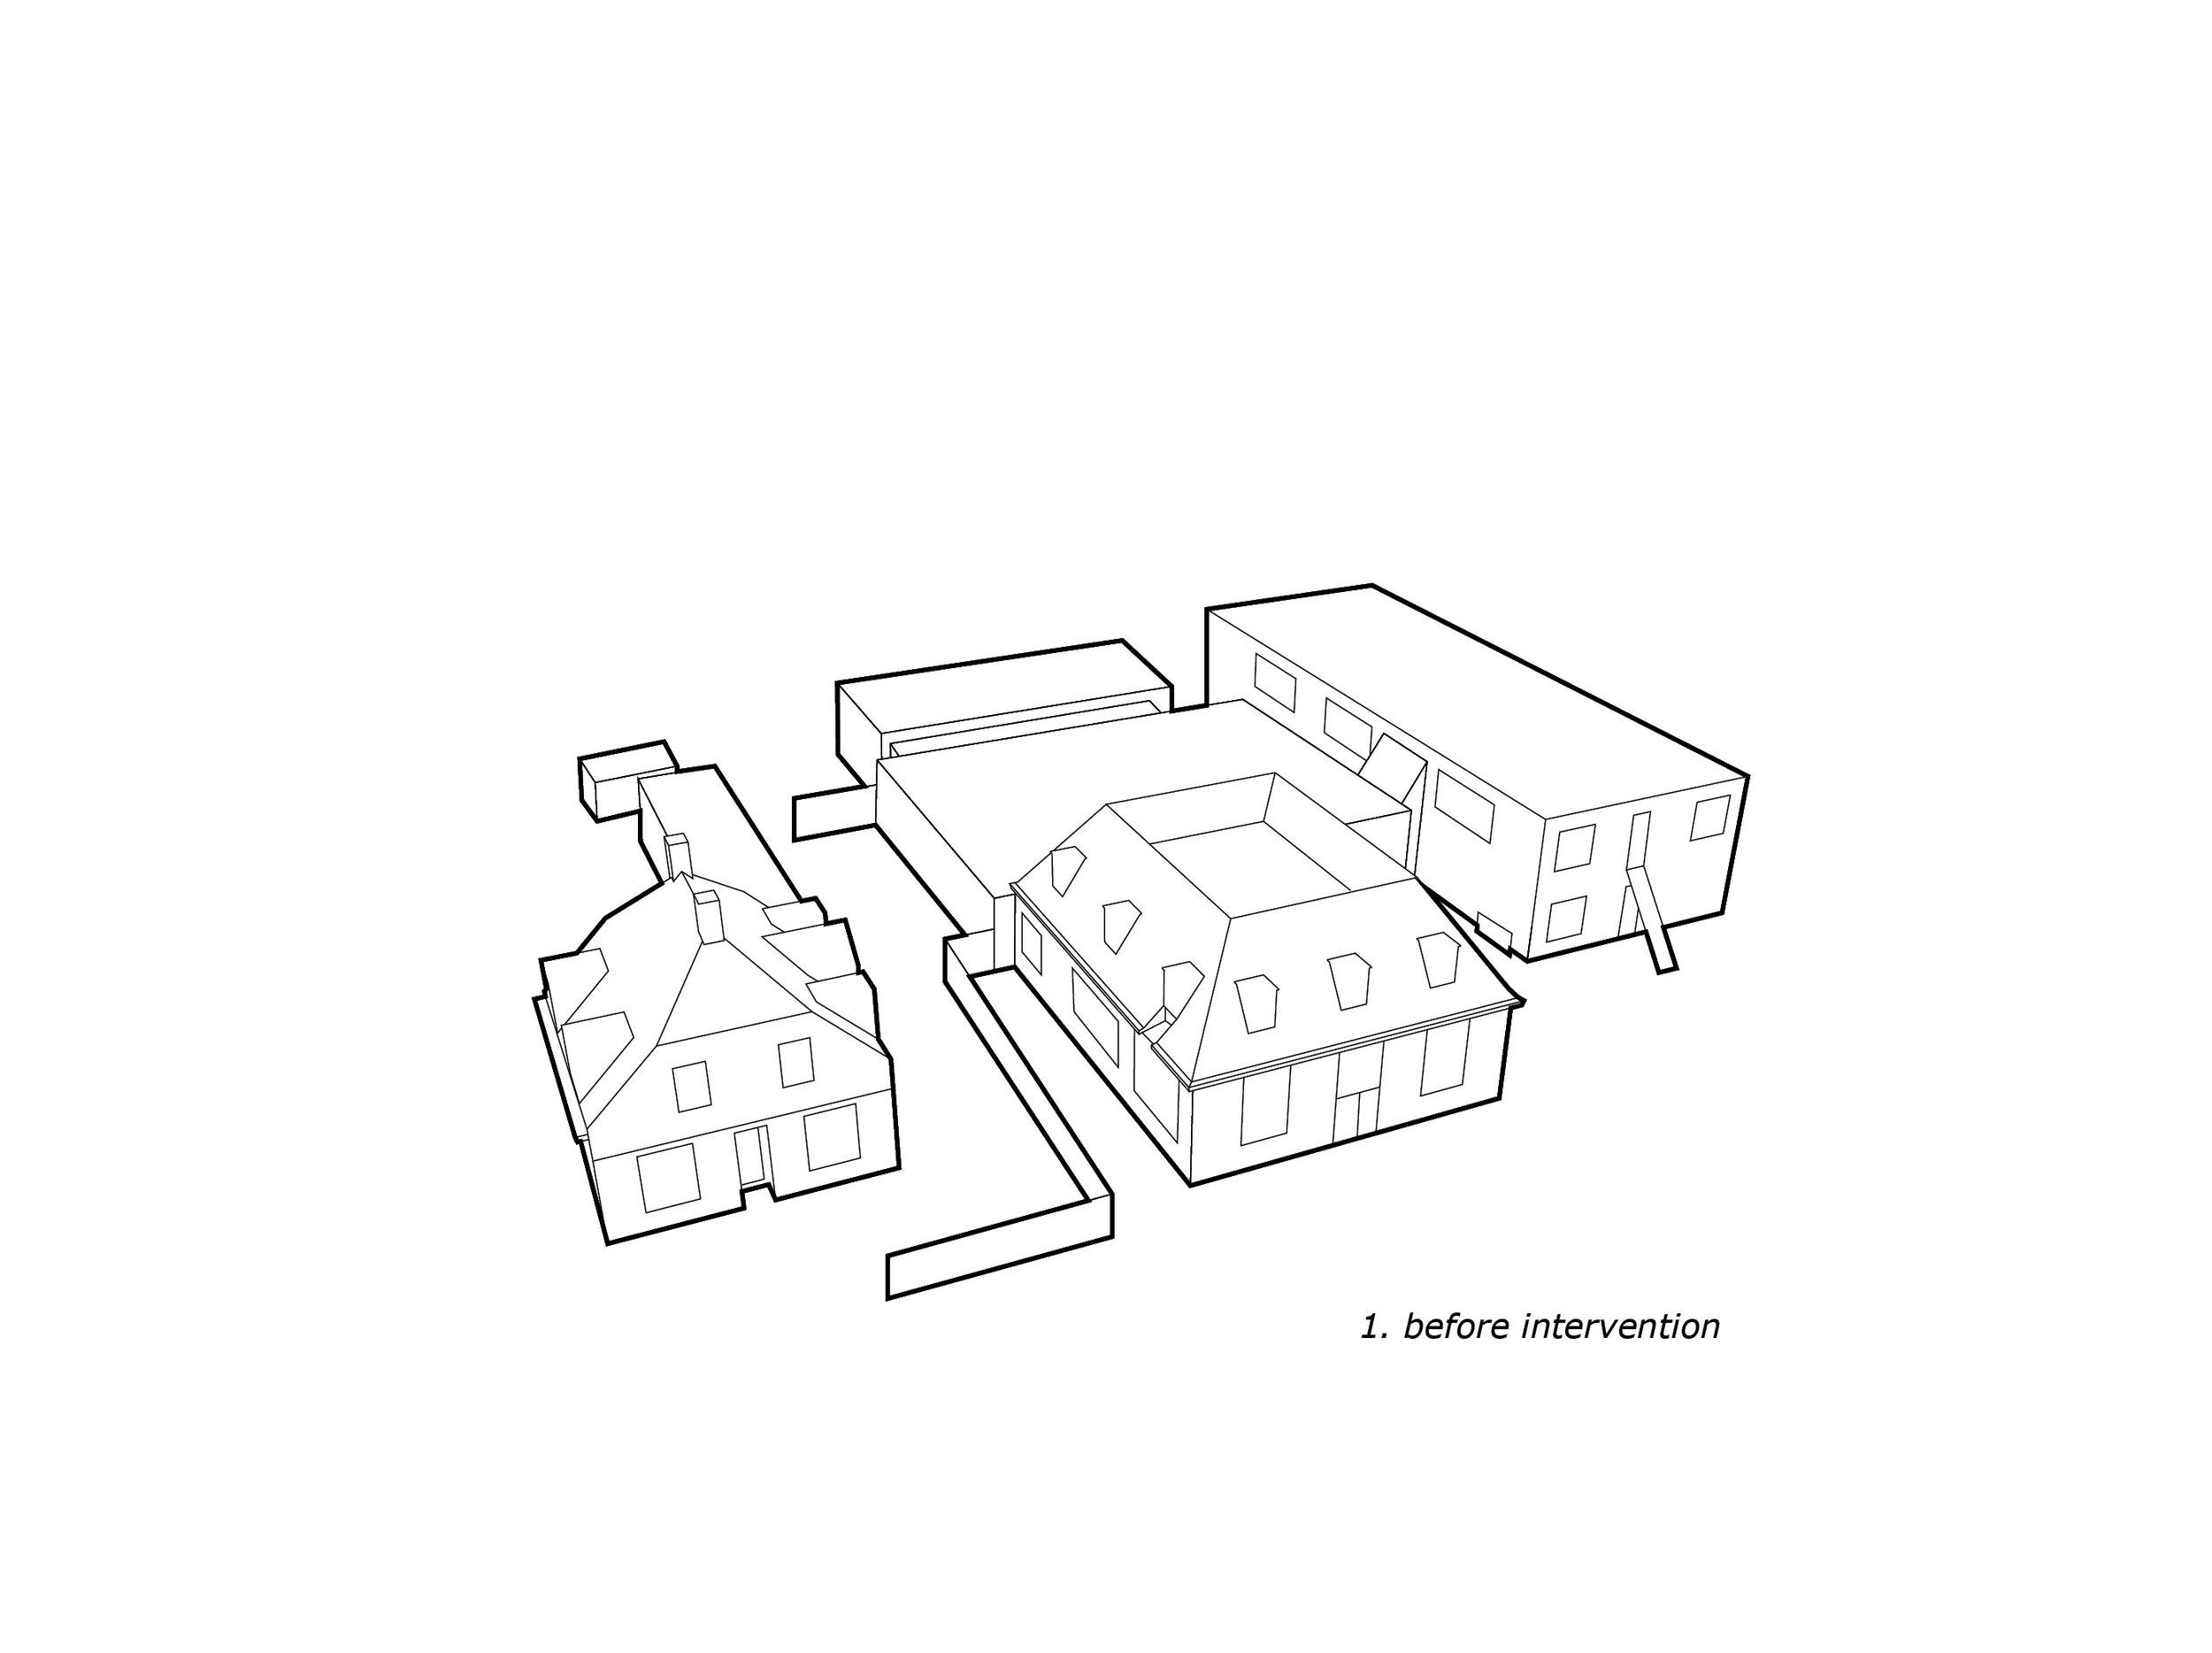 Personal-Architecture-soest-stayokay2-1.jpg